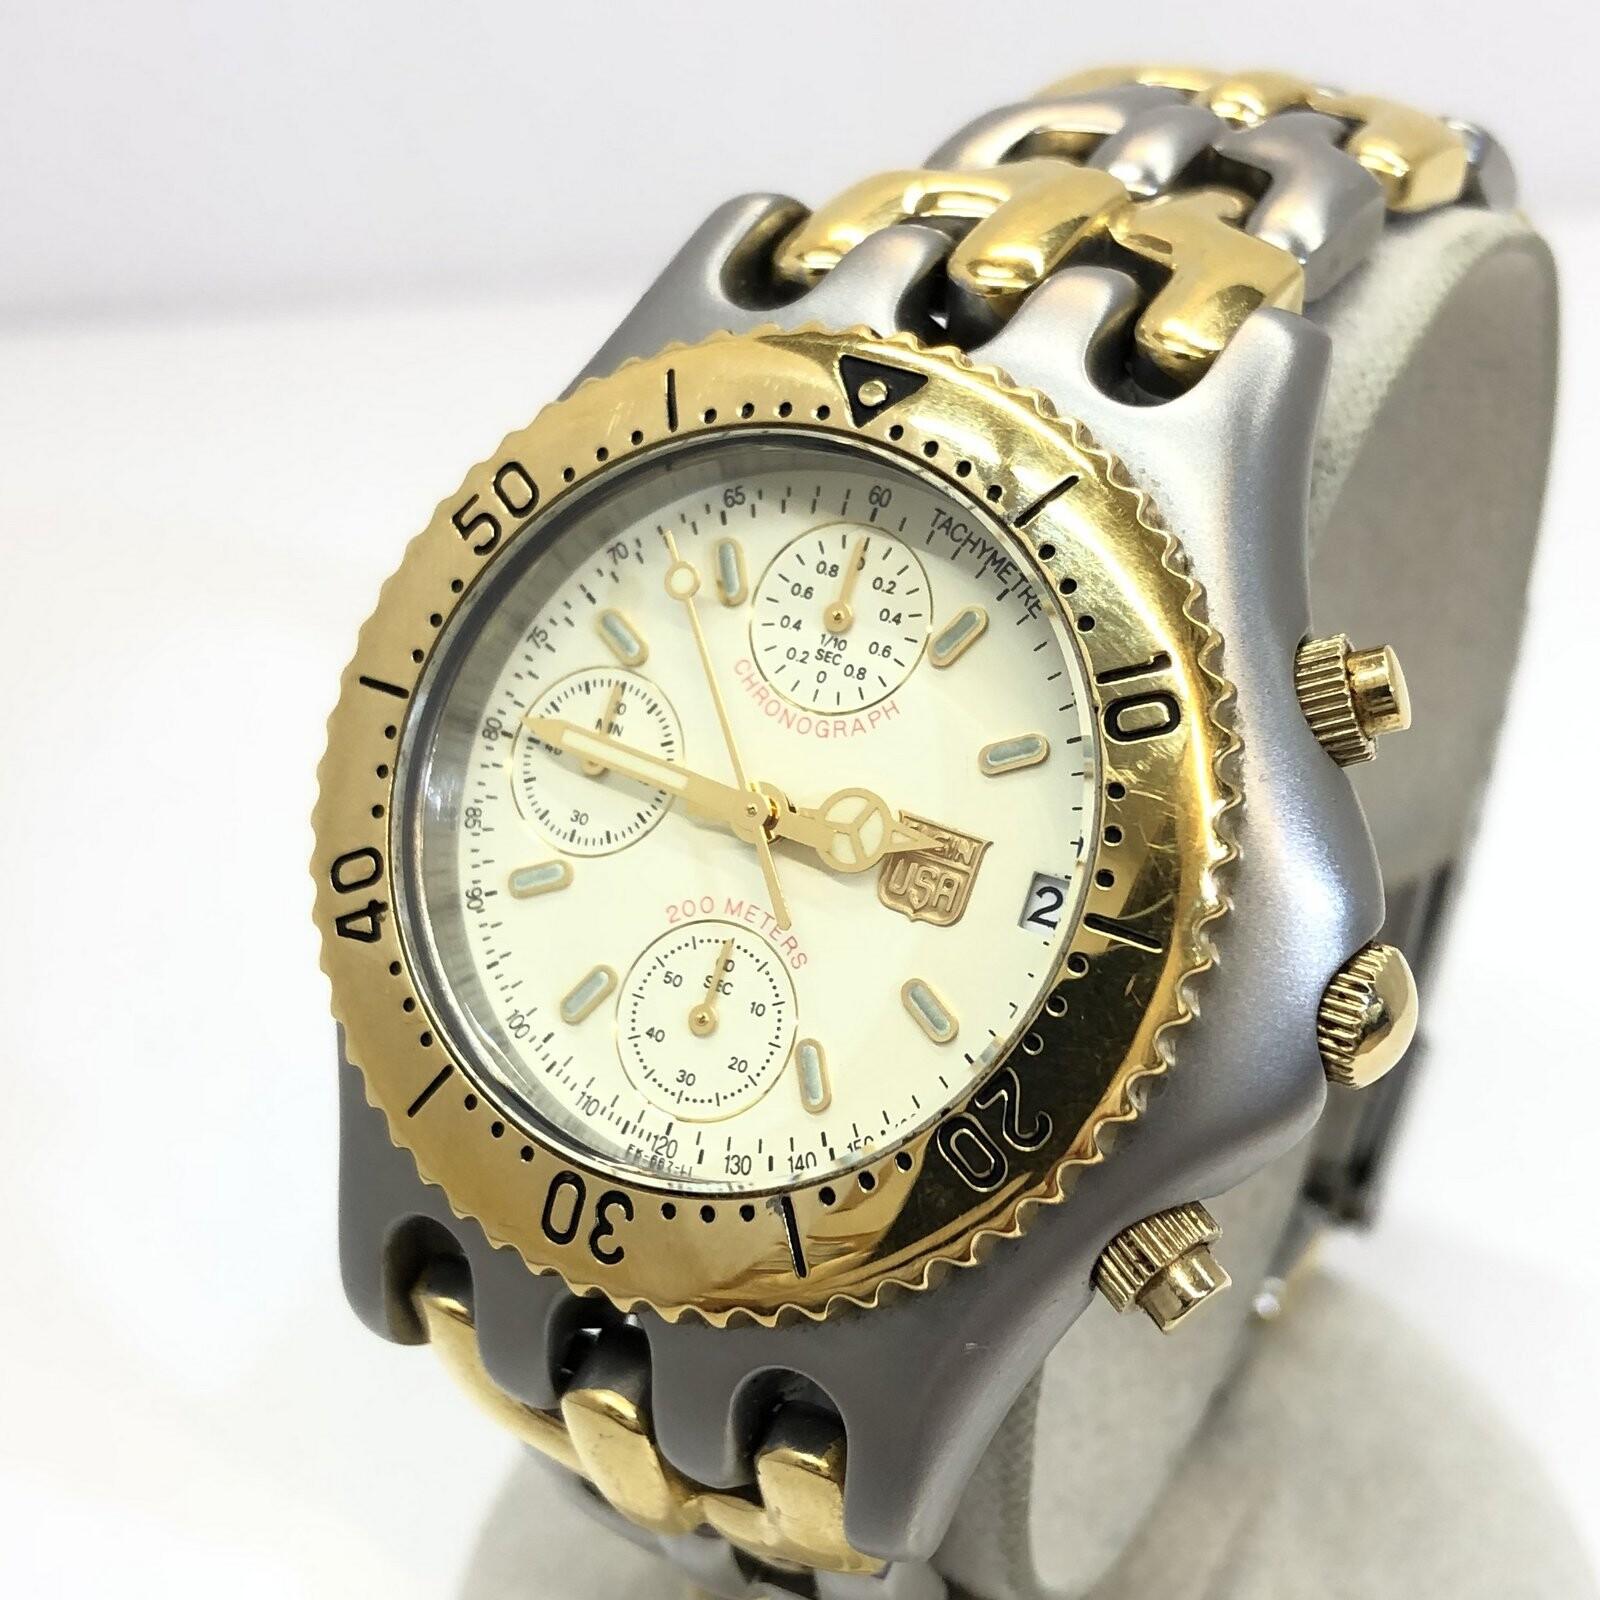 ELGIN お見舞い エルジン 驚きの値段で 腕時計 アナログ クォーツ FK-667-LI クロノグラフ デイト シルバー 中古 メンズ ITQB8TP0OR7V 回転ベゼル ステンレス ゴールド T東大阪店 コンビ RY4908